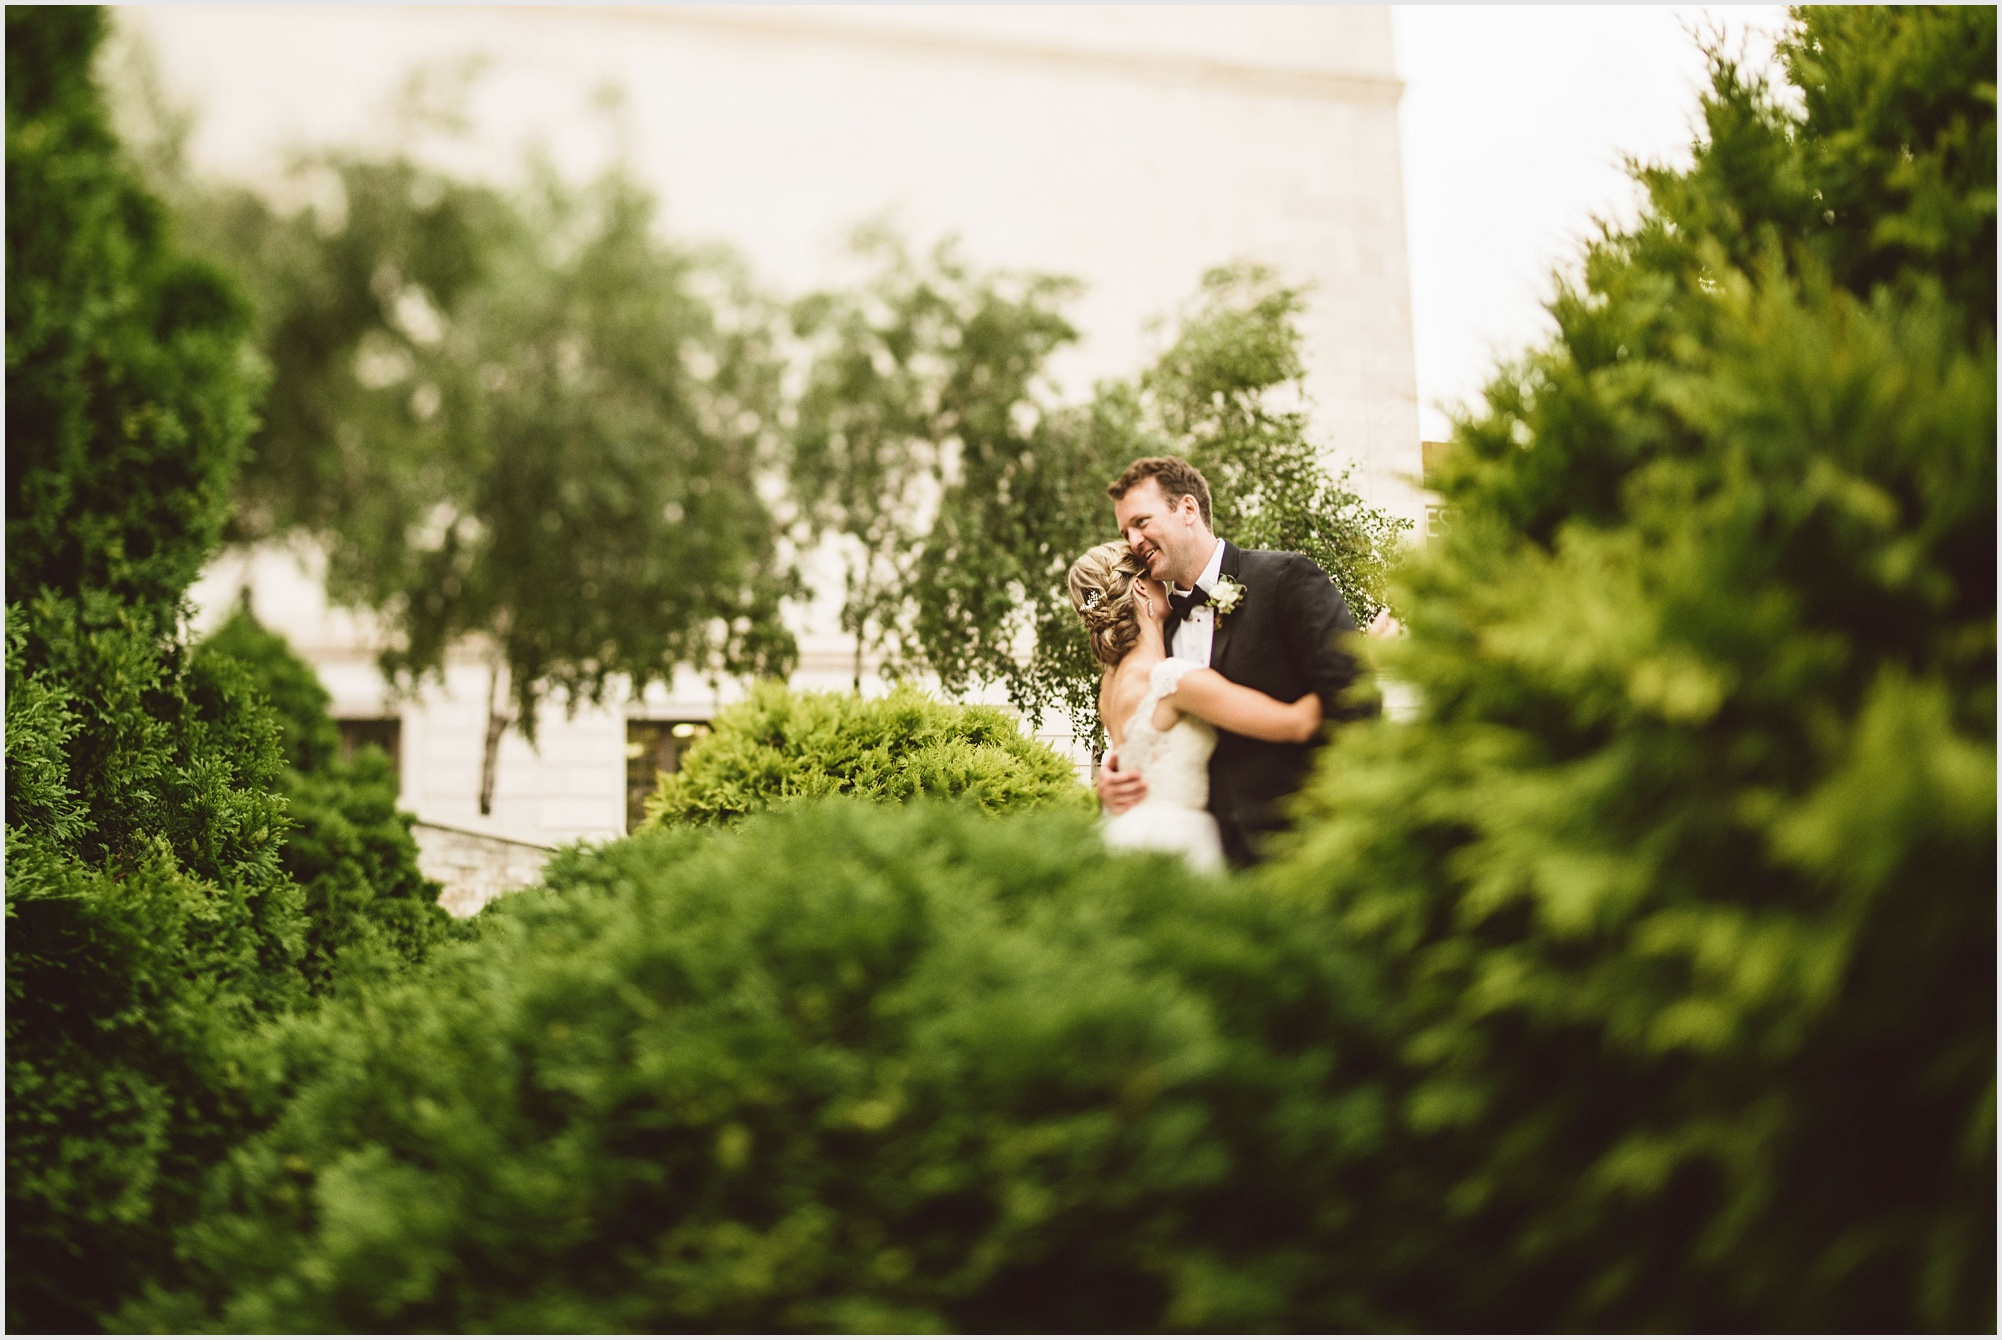 maura_david_james_j_hill_wedding_lucas_botz_photography_049.jpg